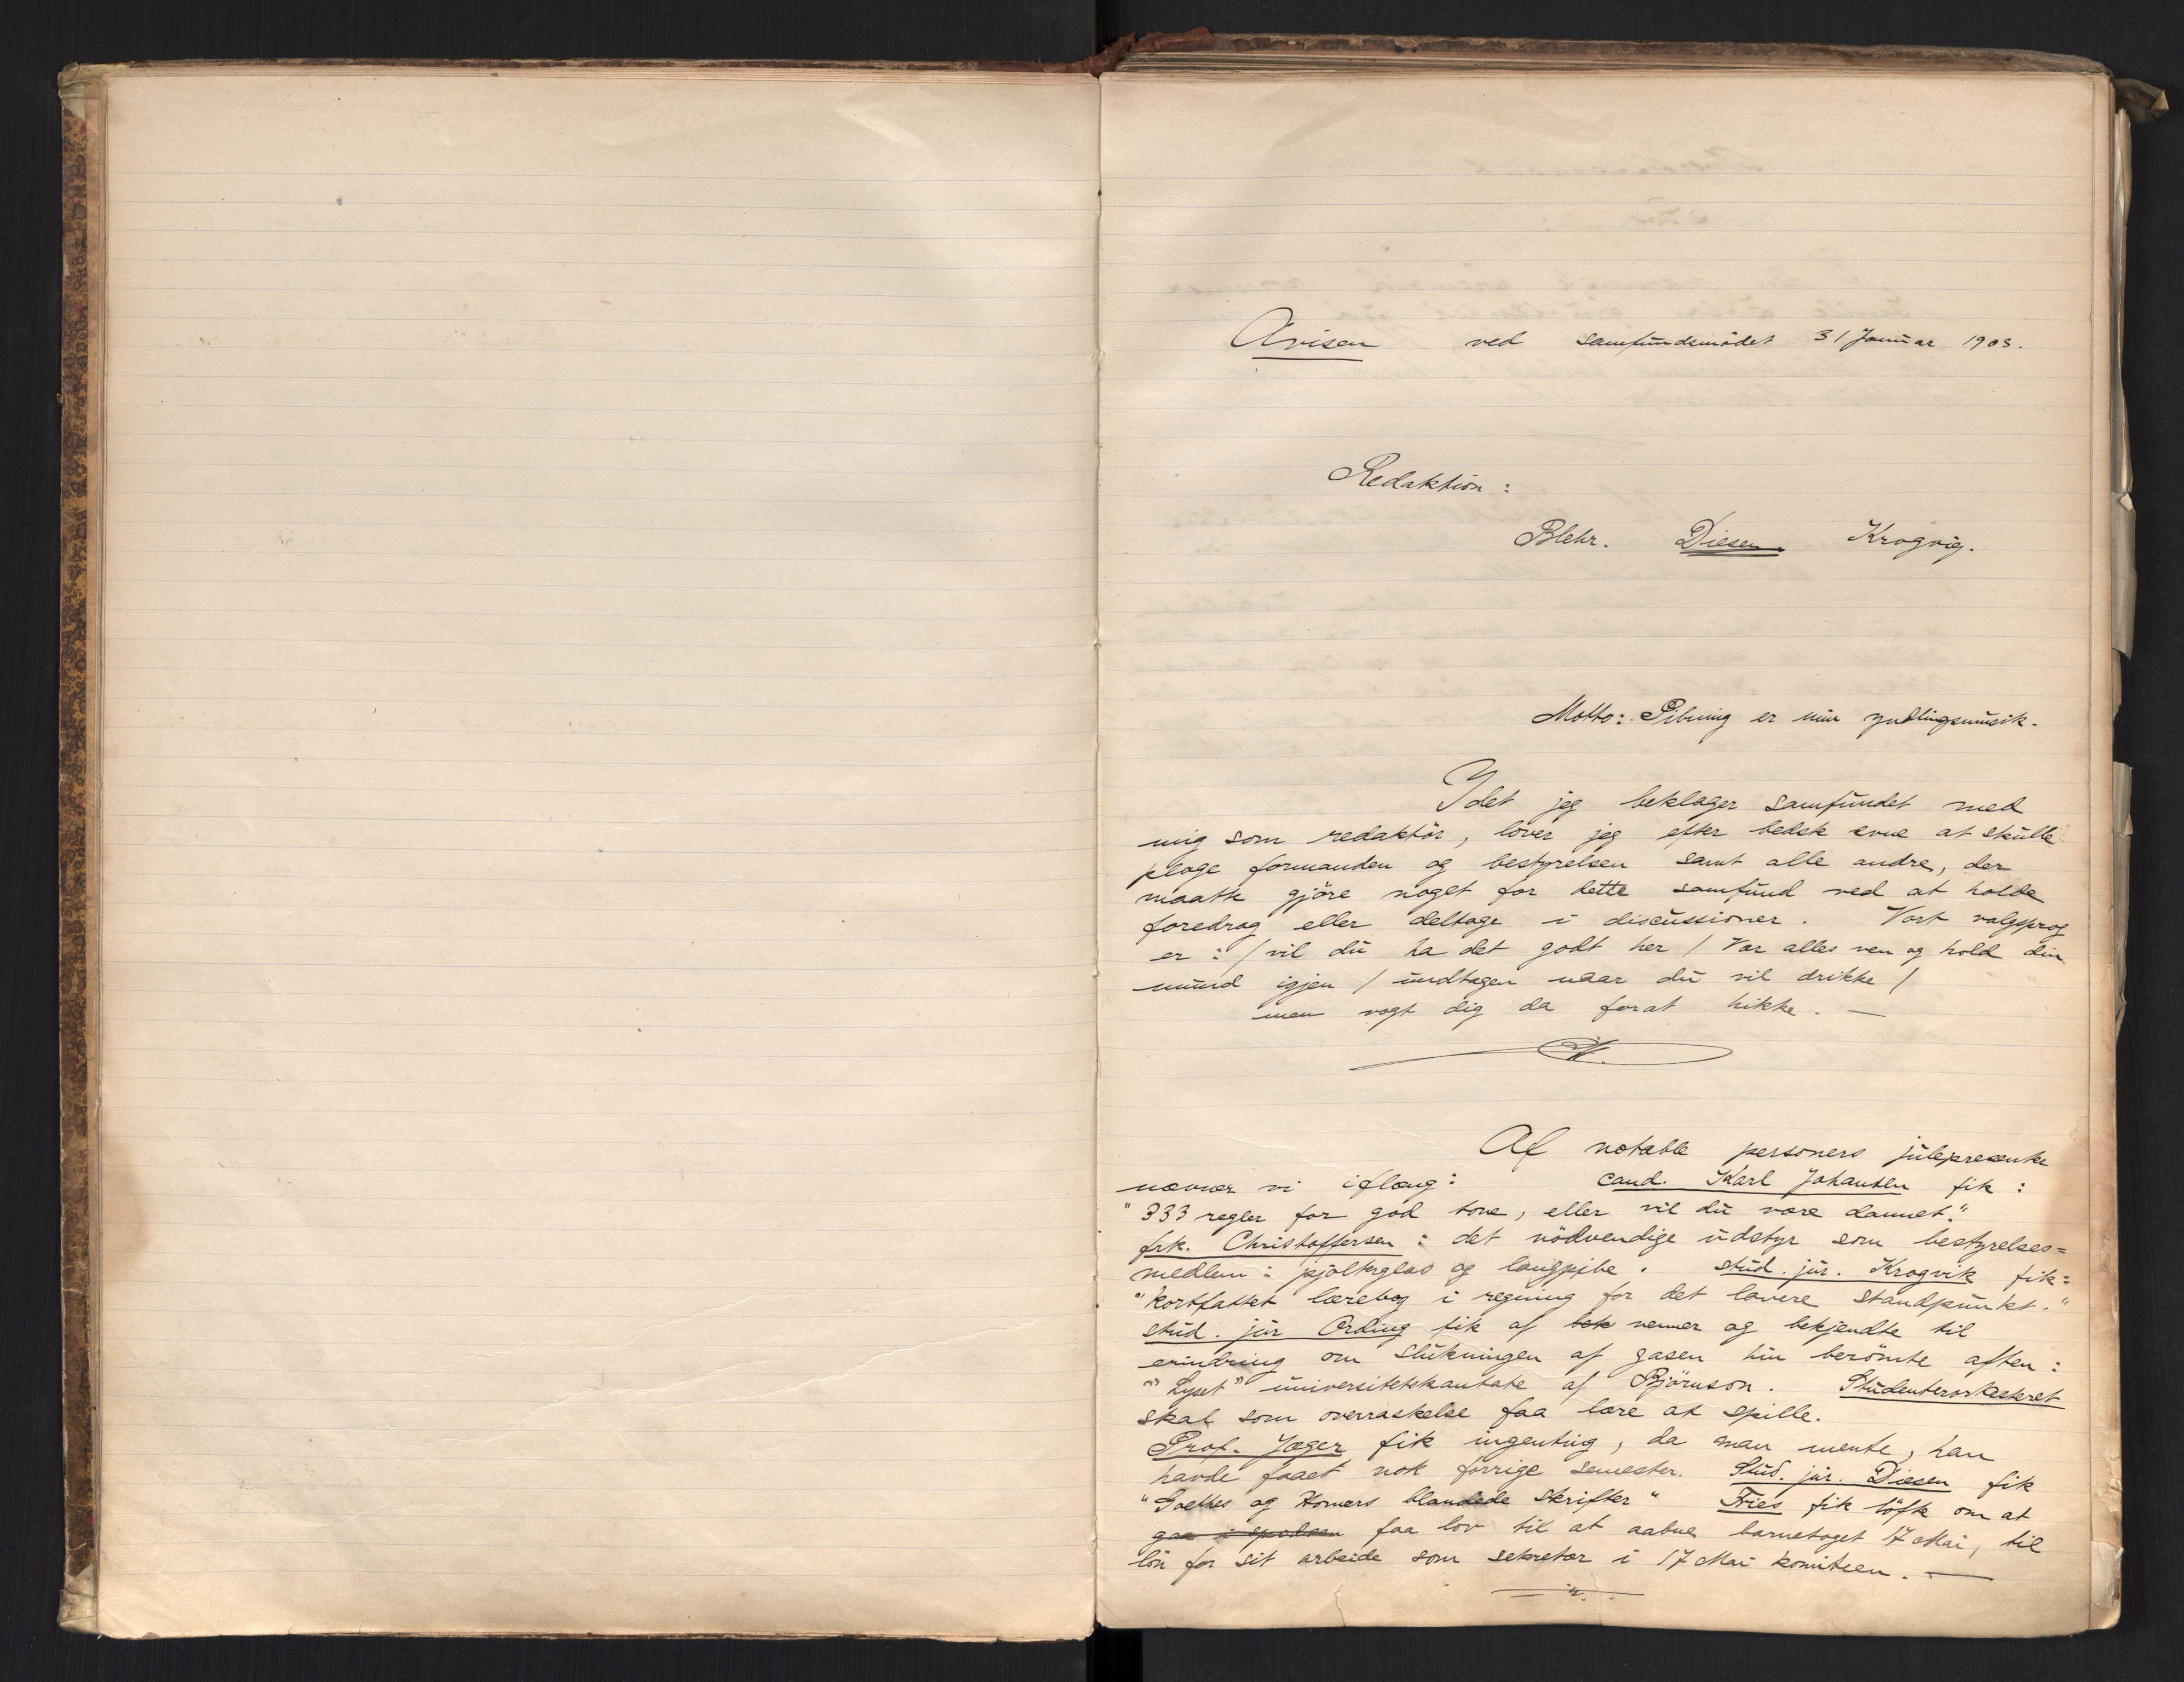 RA, Det Norske Studentersamfund, X/Xa/L0017, 1902-1904, s. 11